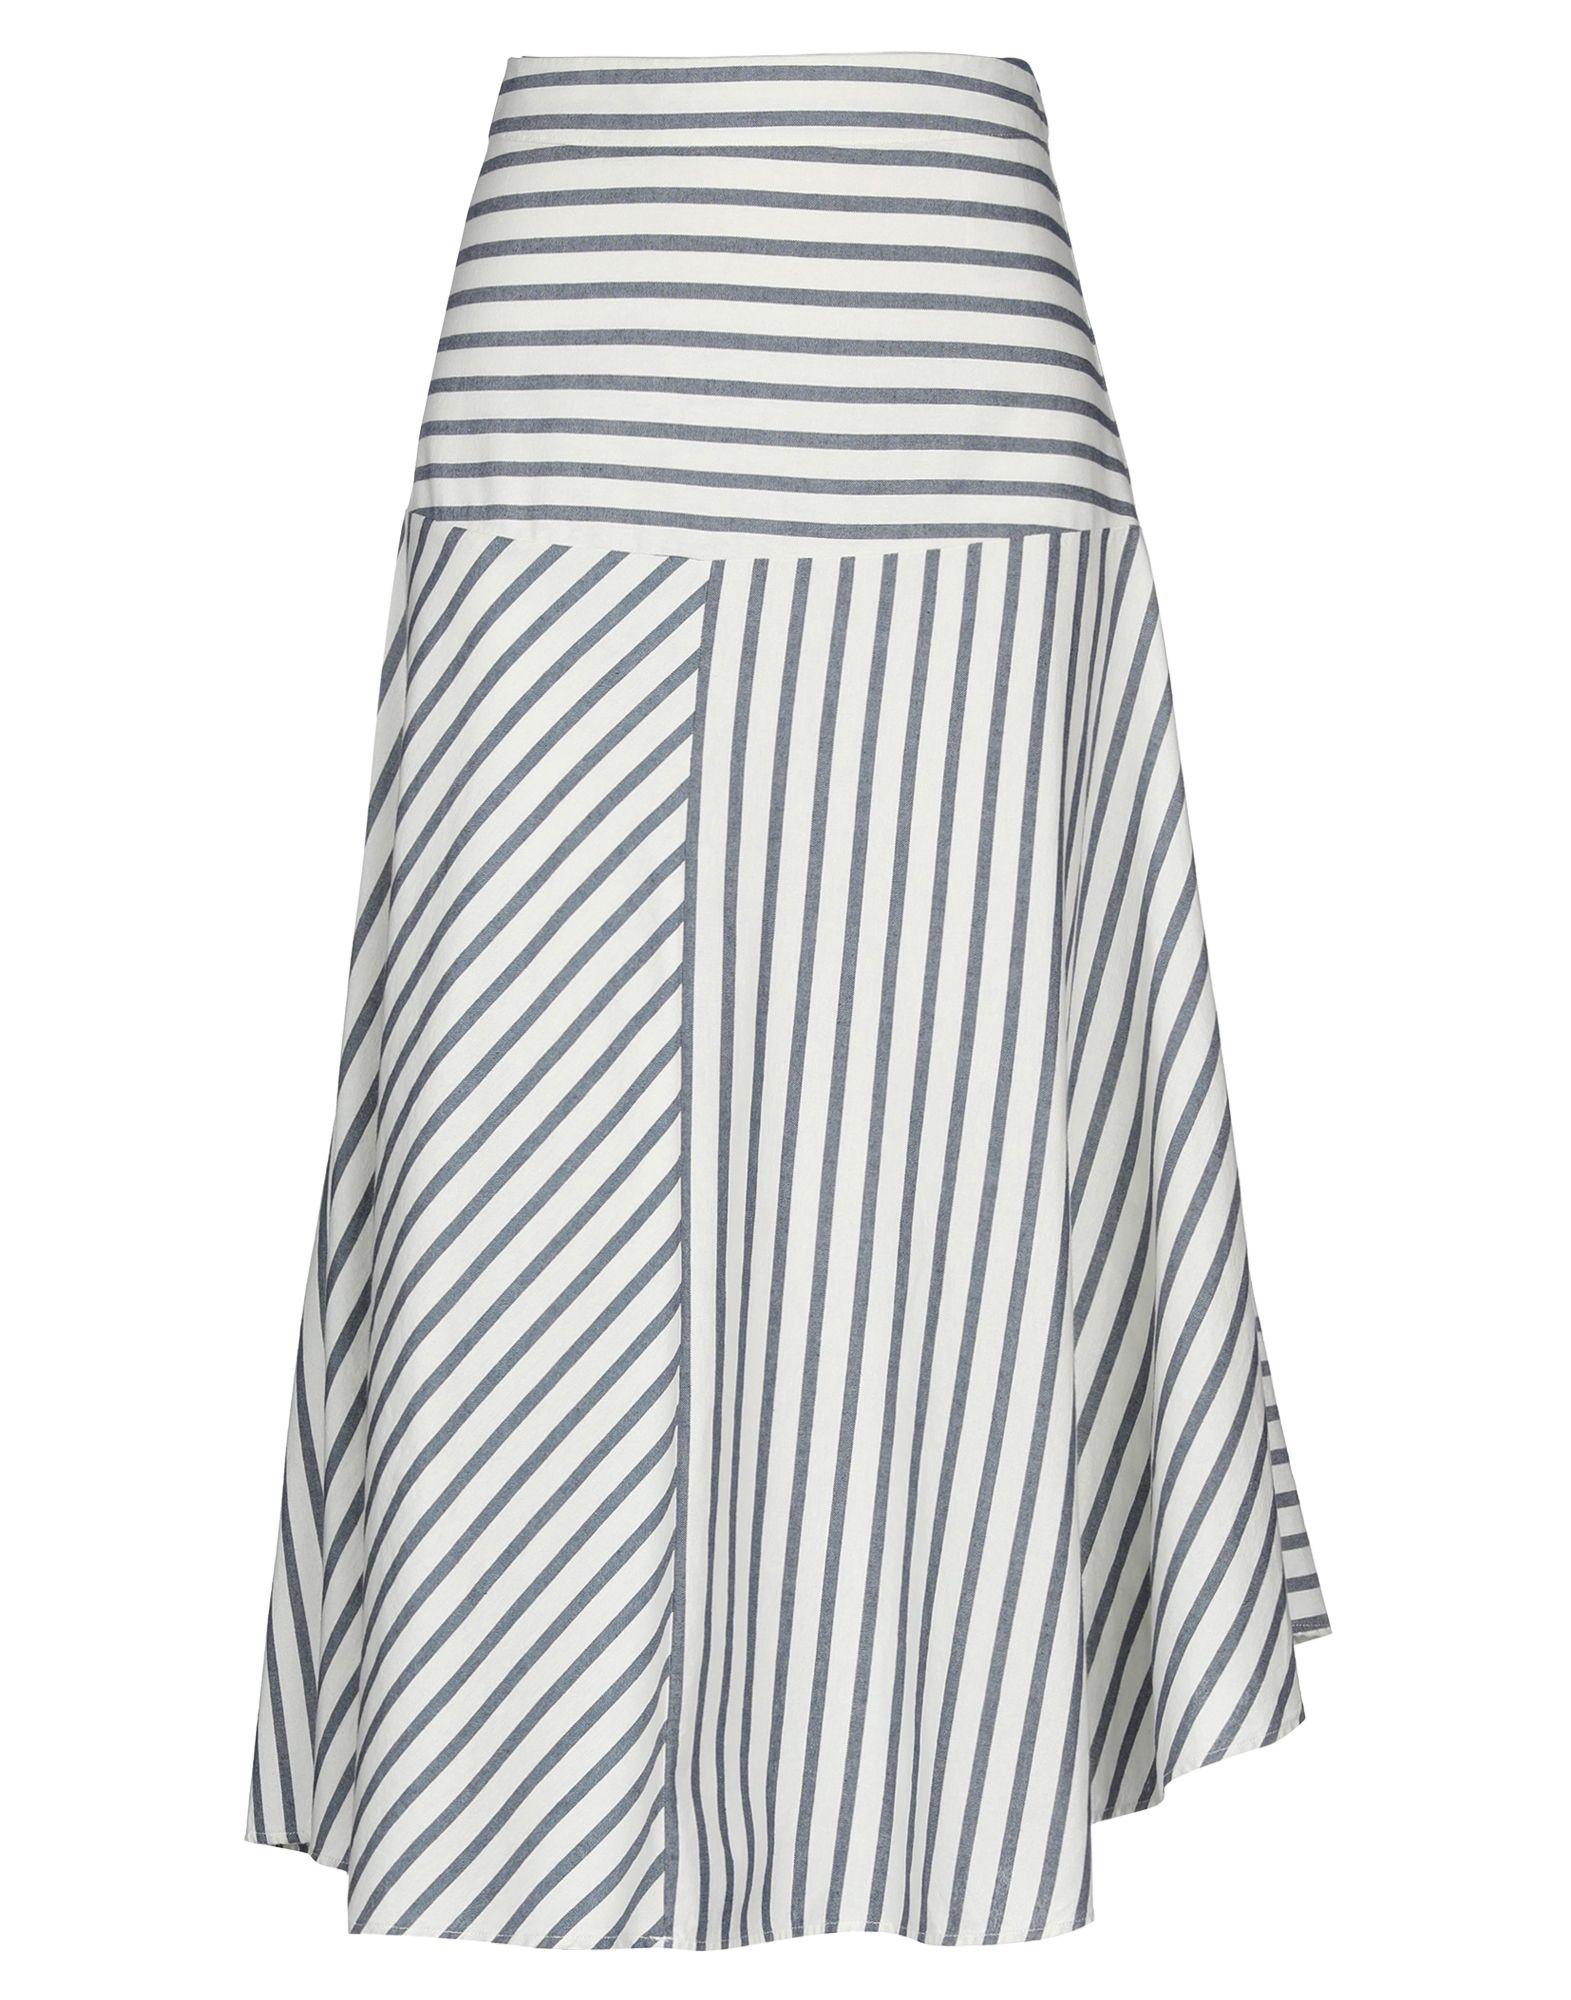 MAX & CO. Юбка длиной 3/4 co юбка длиной 3 4